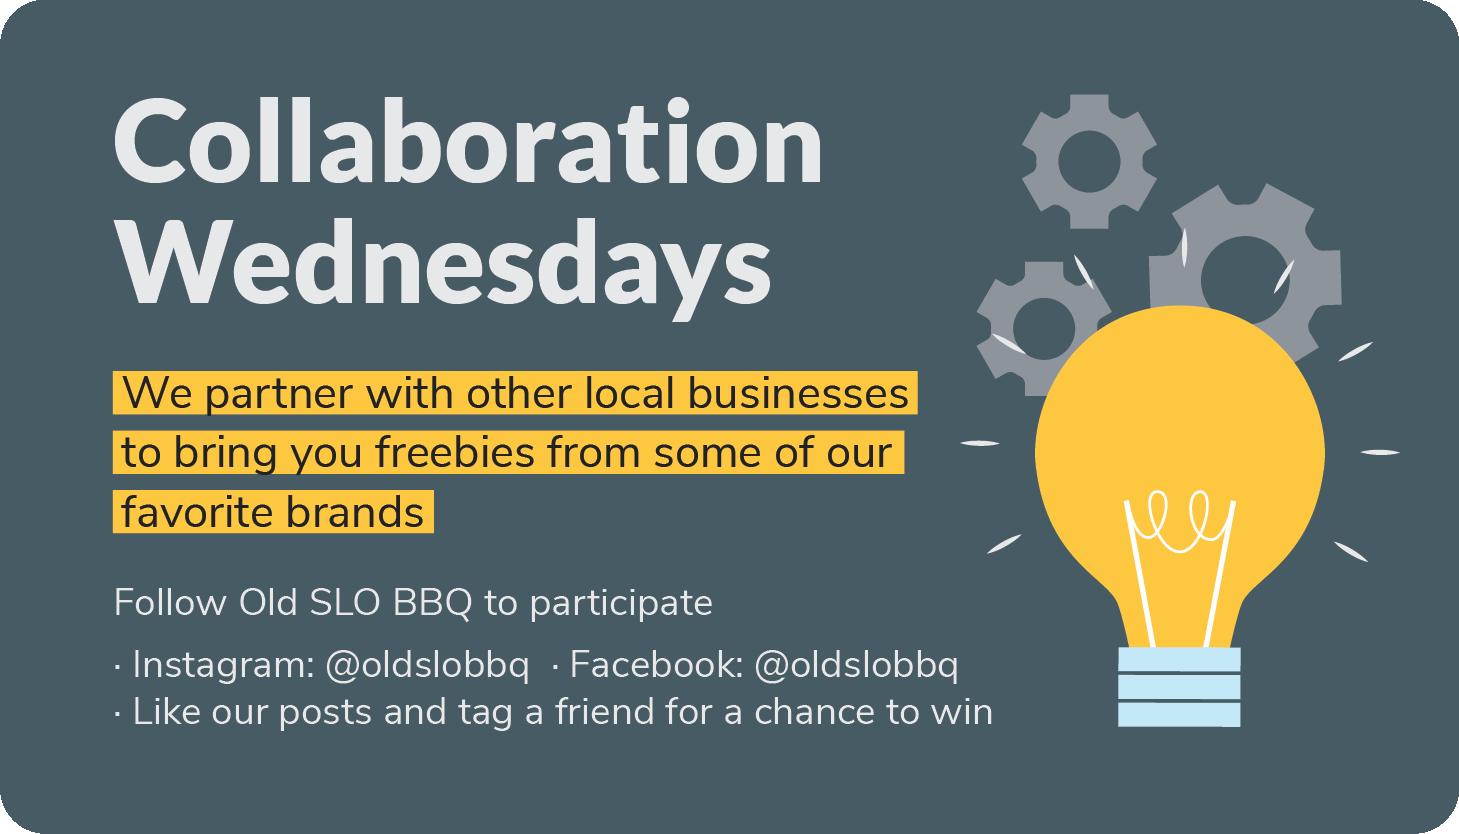 Collaboration Wednesdays